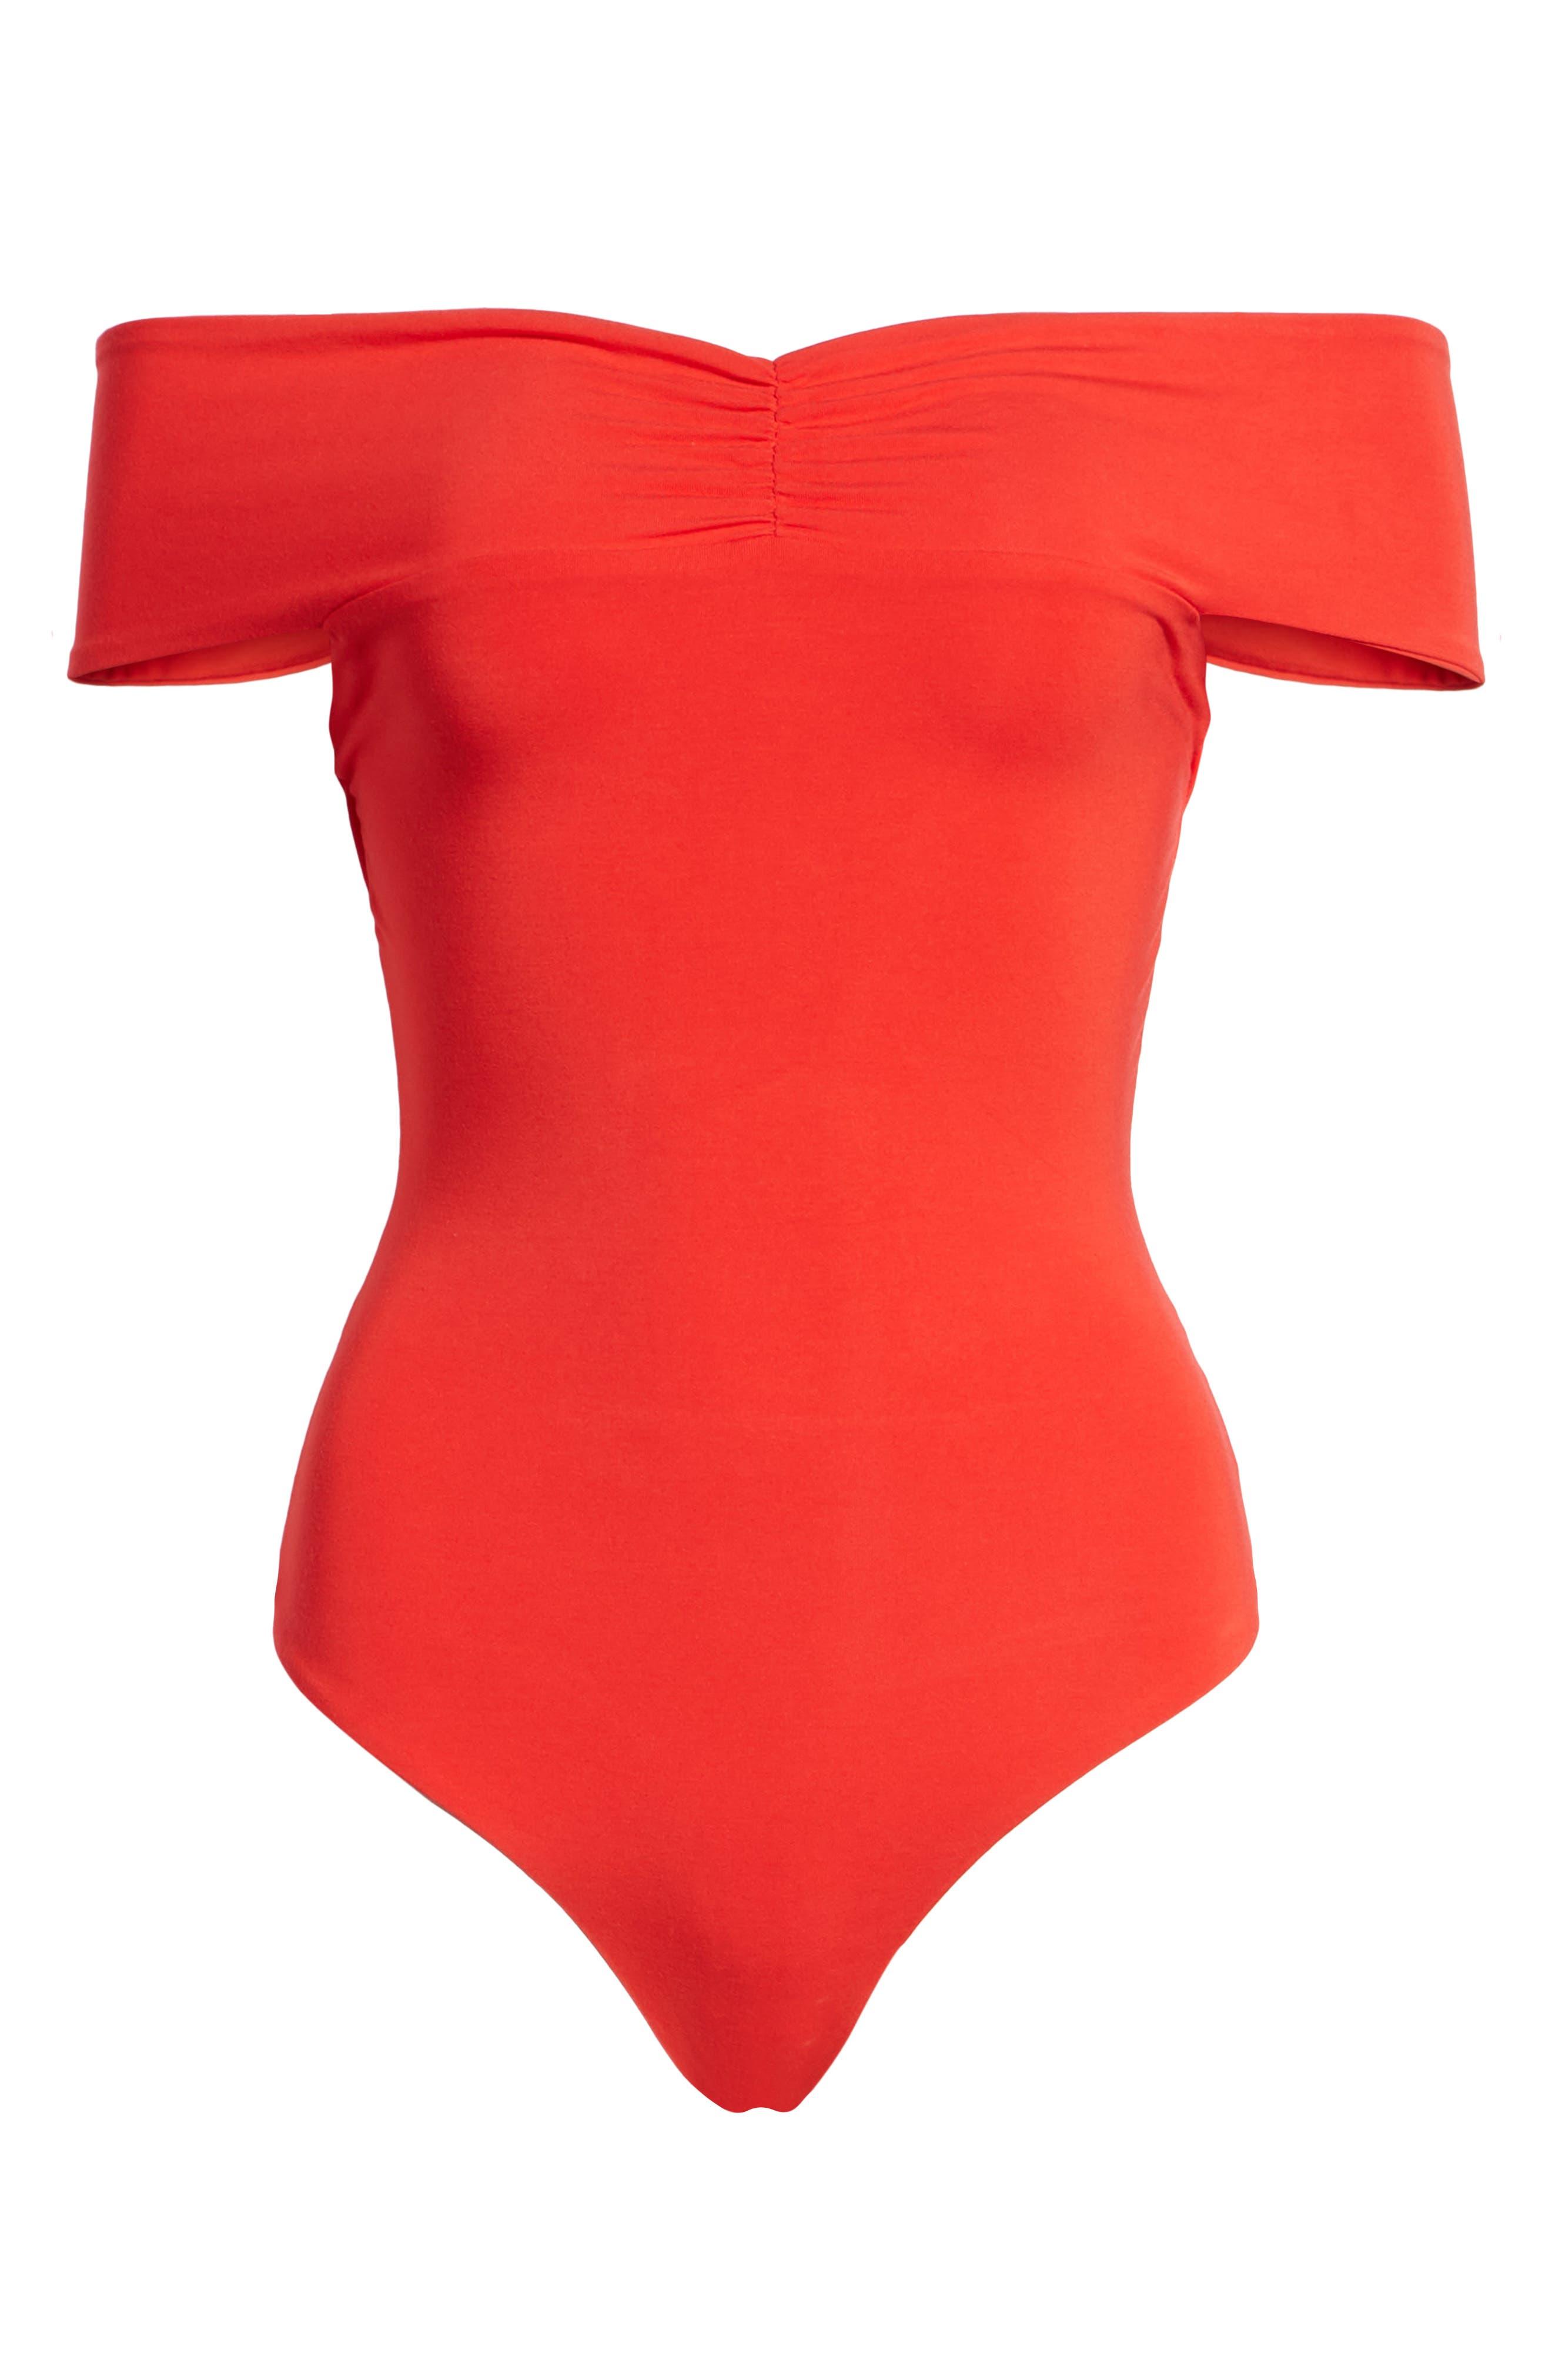 Neil Off the Shoulder Bodysuit,                             Alternate thumbnail 6, color,                             600